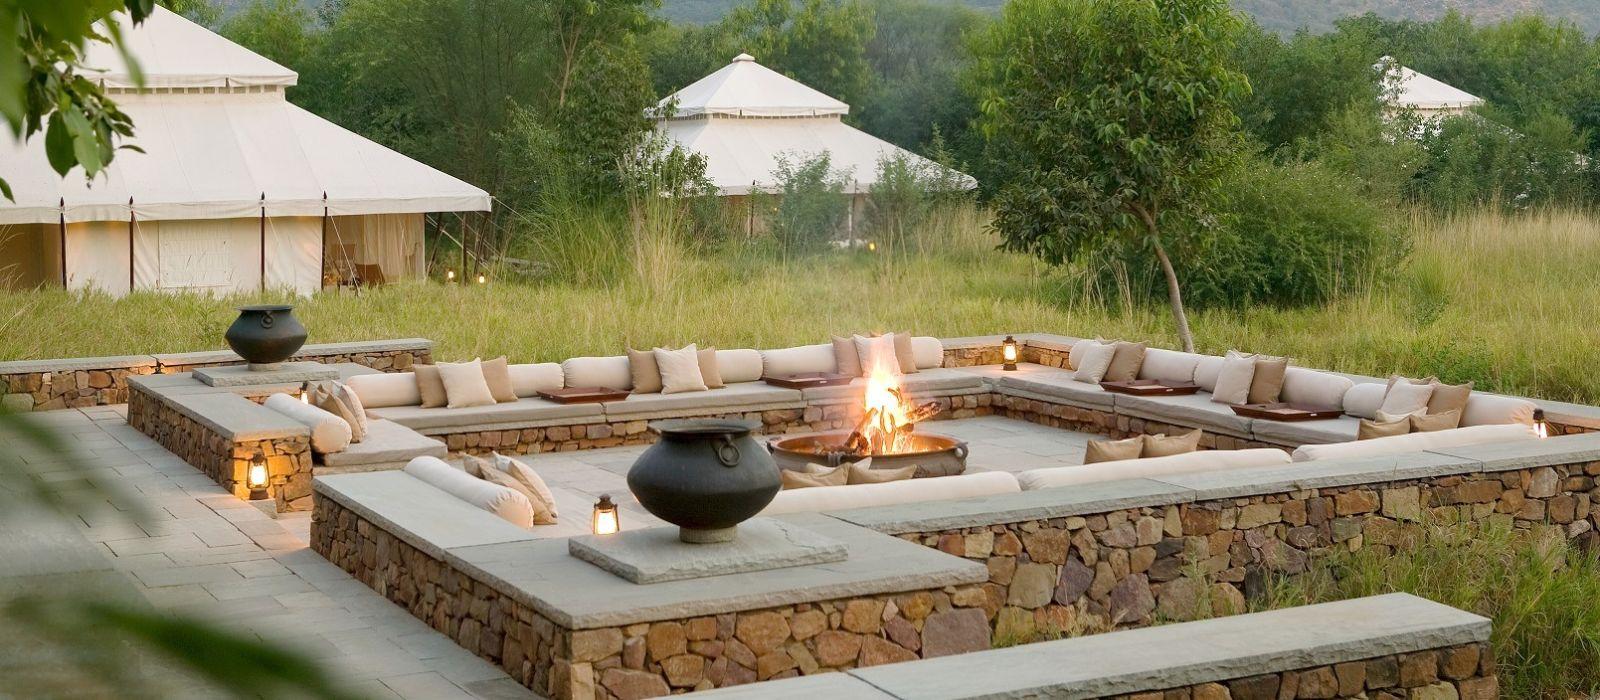 Oberoi Exklusiv: Royales Rajasthan und Safari Abenteuer Urlaub 5